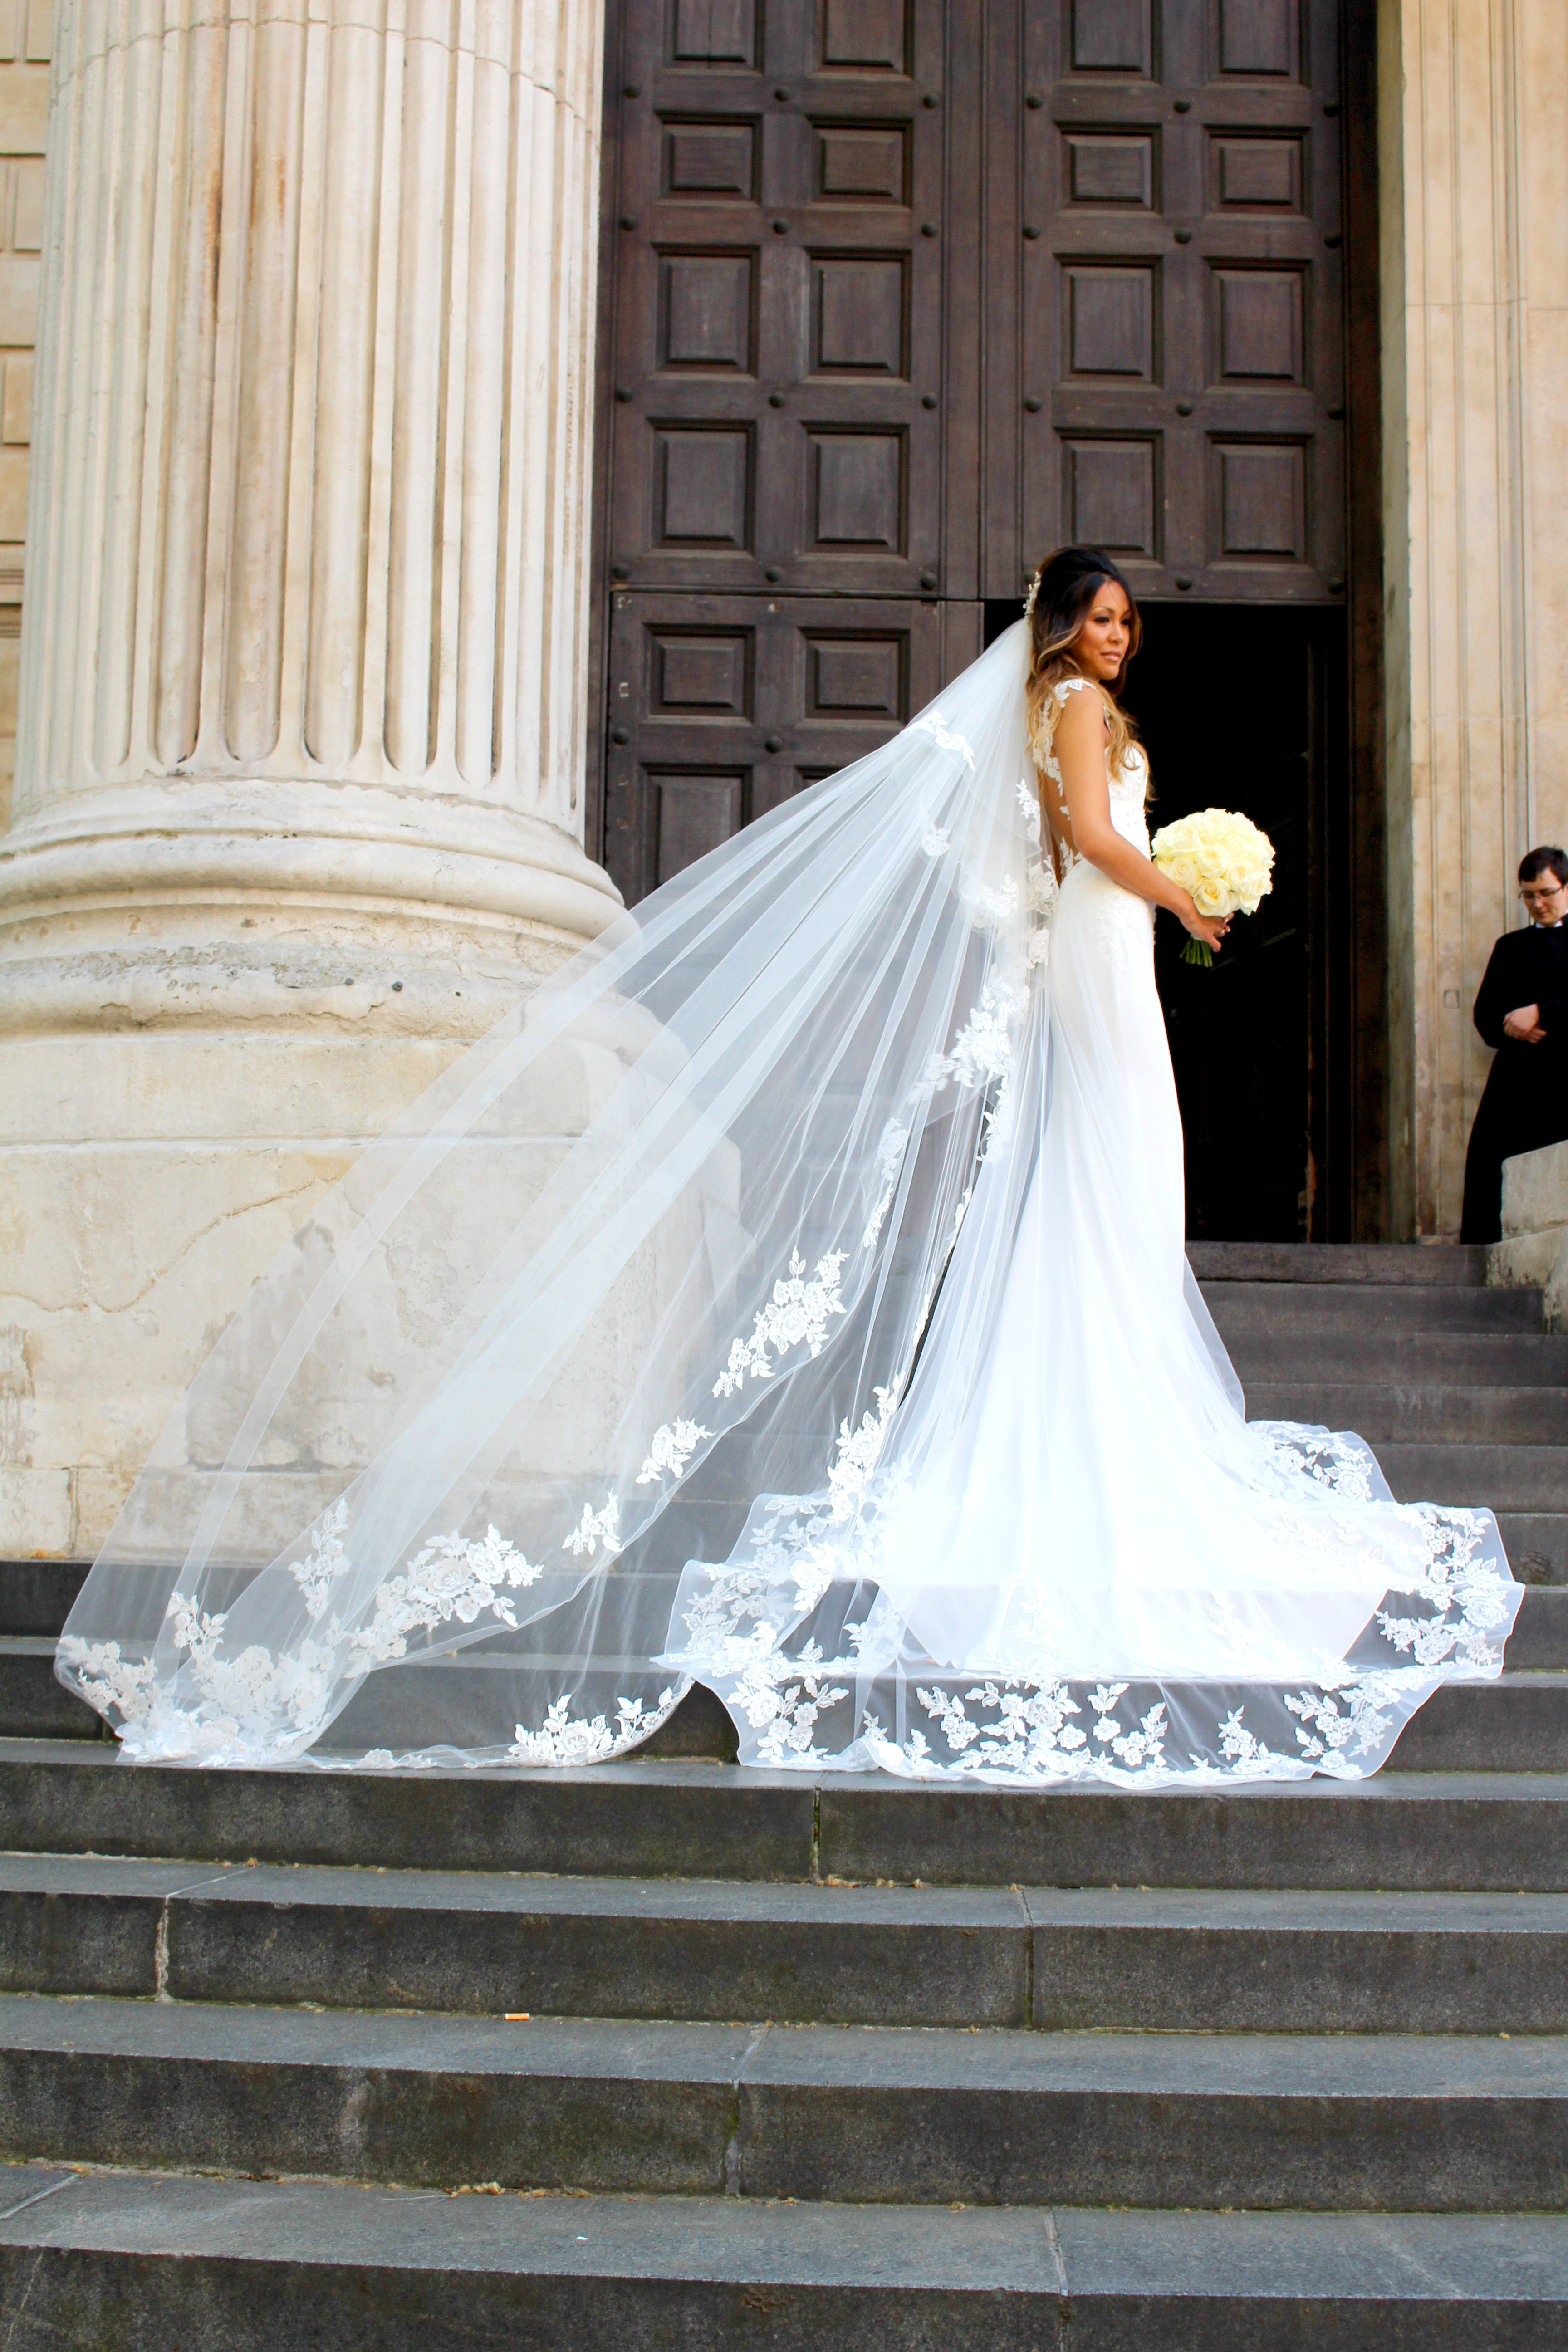 real Bride - Kimberely - Wearing Dando London wedding dress with ...